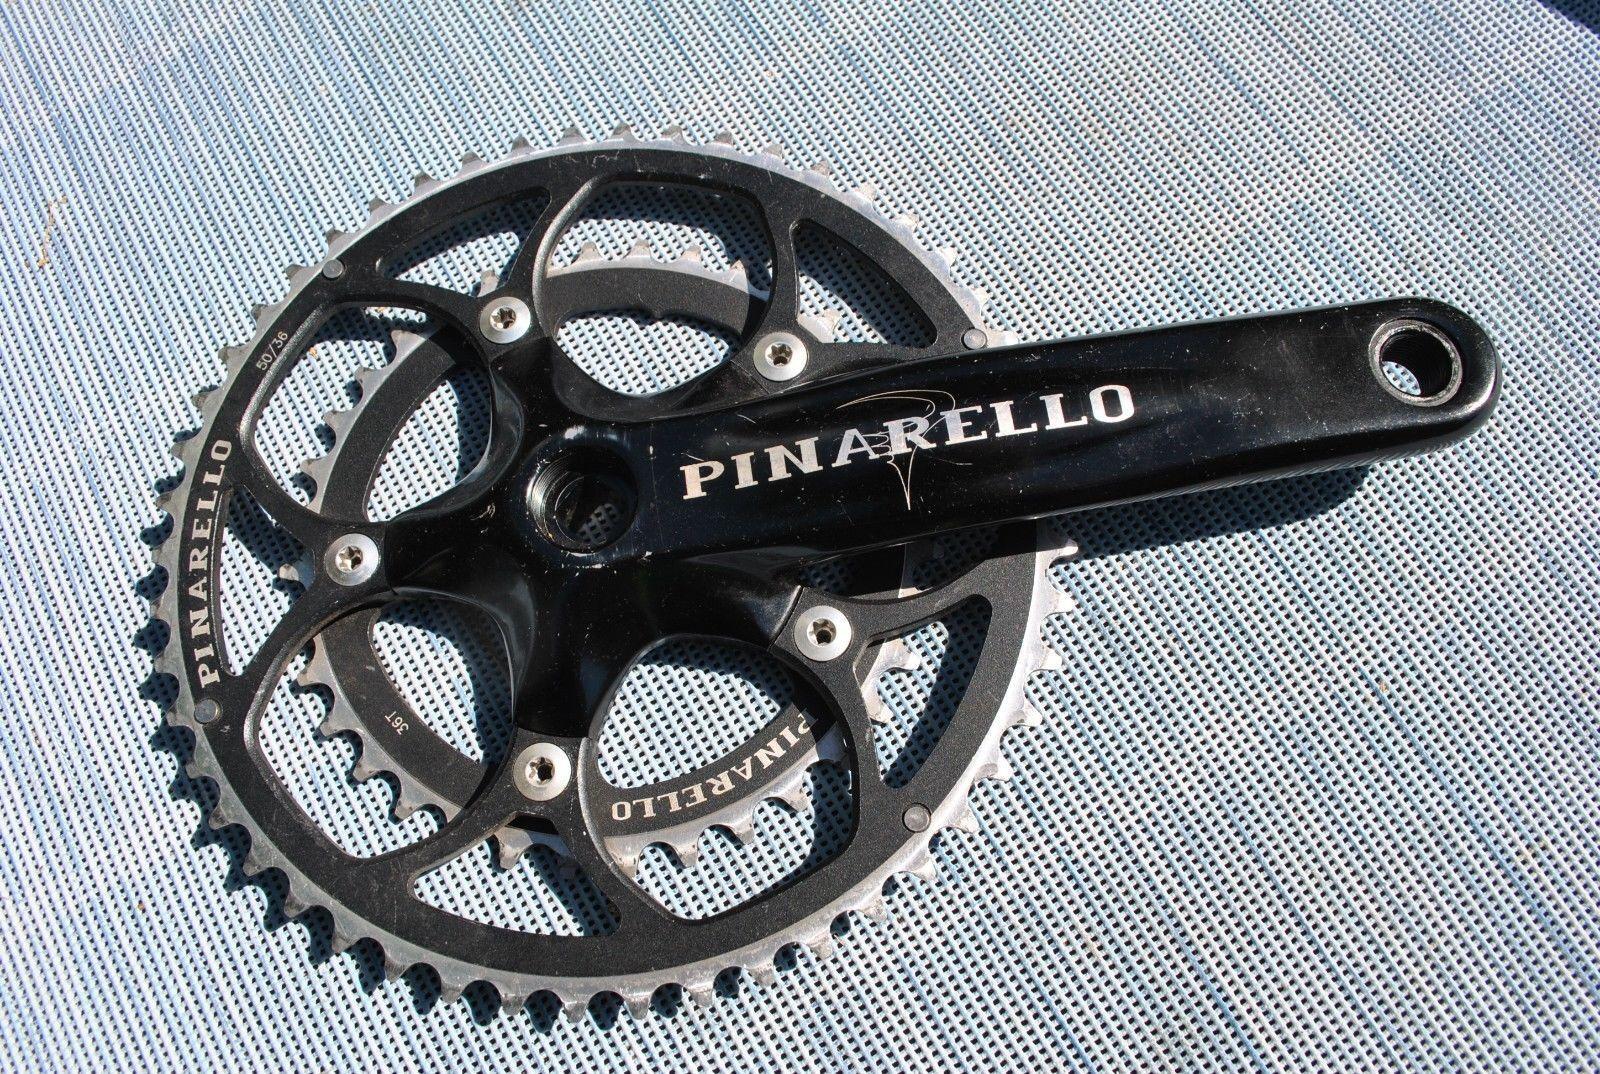 Vintage - PINARELLO  K305 - bicycle crankset 172,5 mm rights  online shop